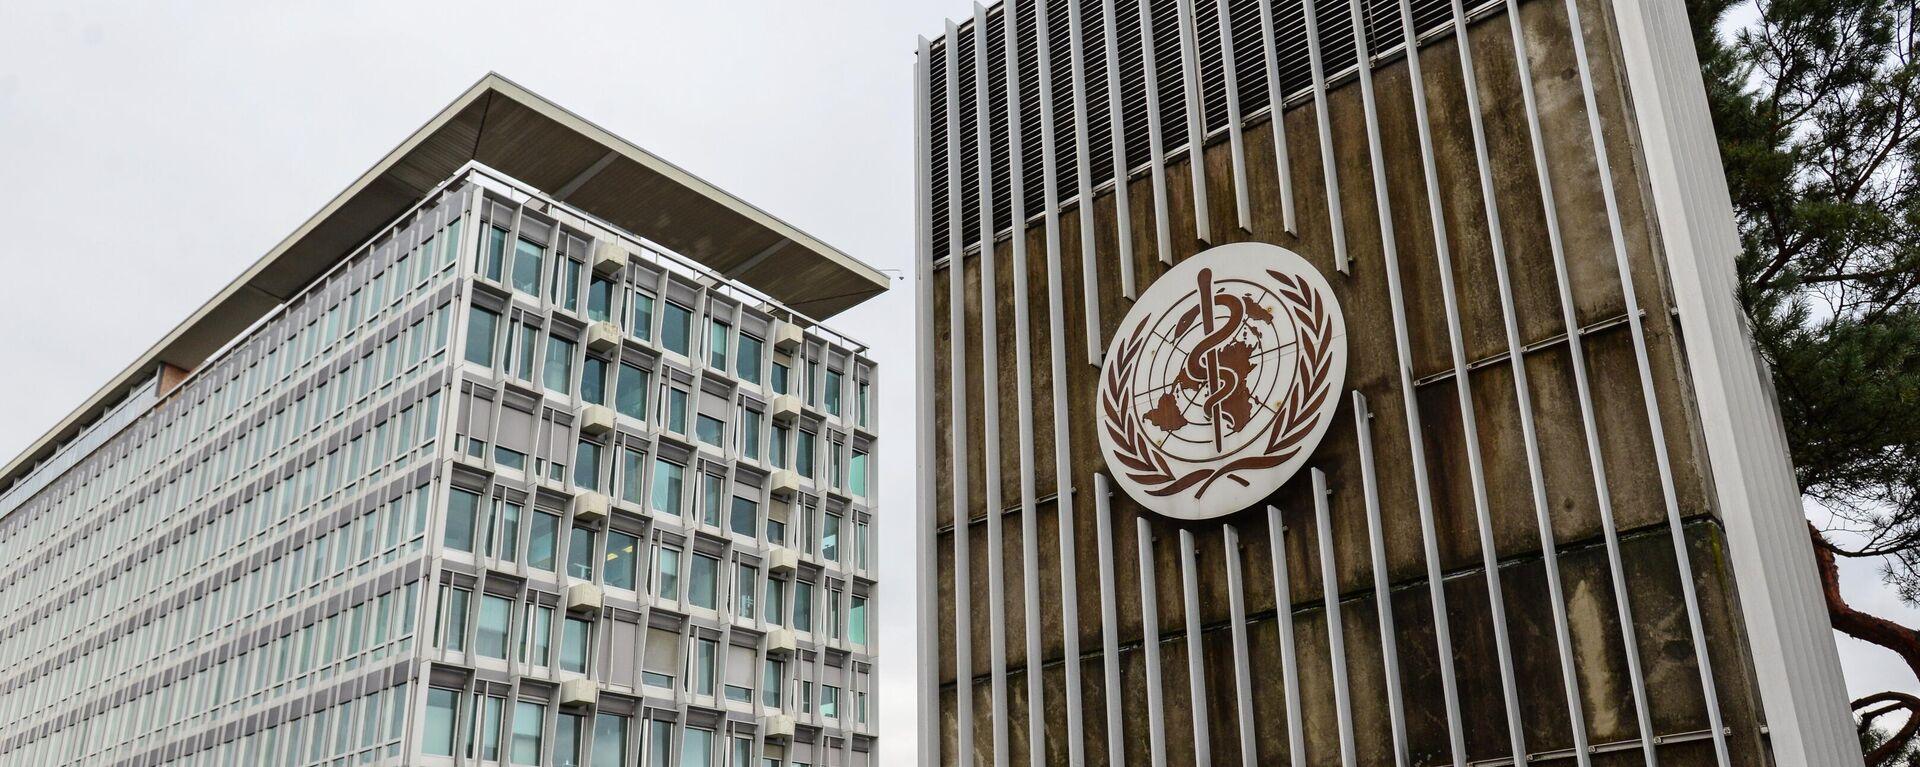 Weltgesundheitsorganisation (WHO) - SNA, 1920, 17.02.2021